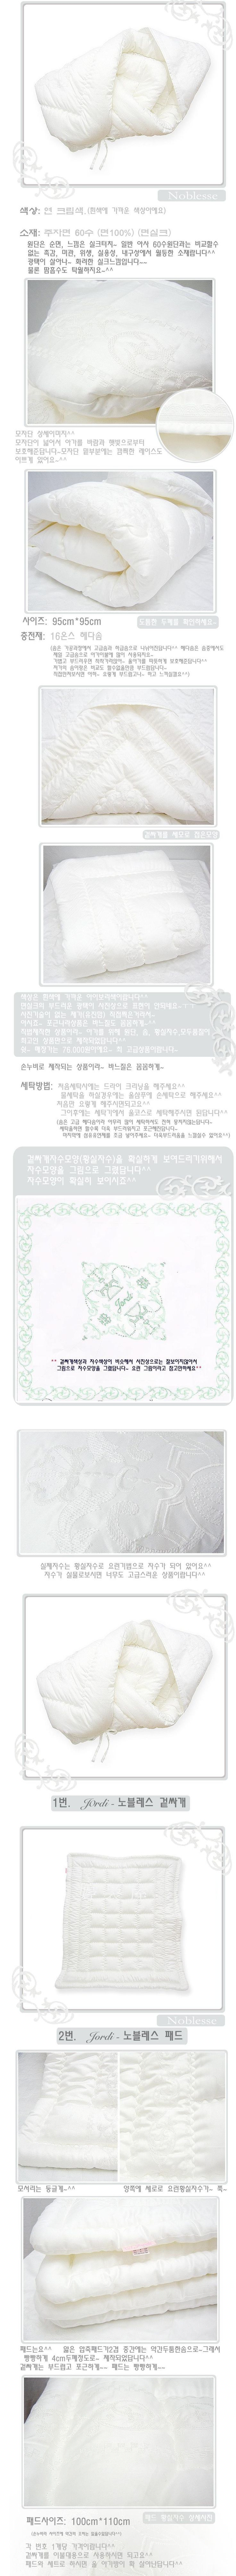 Конверт для новорожденного. Цена 6564р. на izobility.com. Артикул №239249161